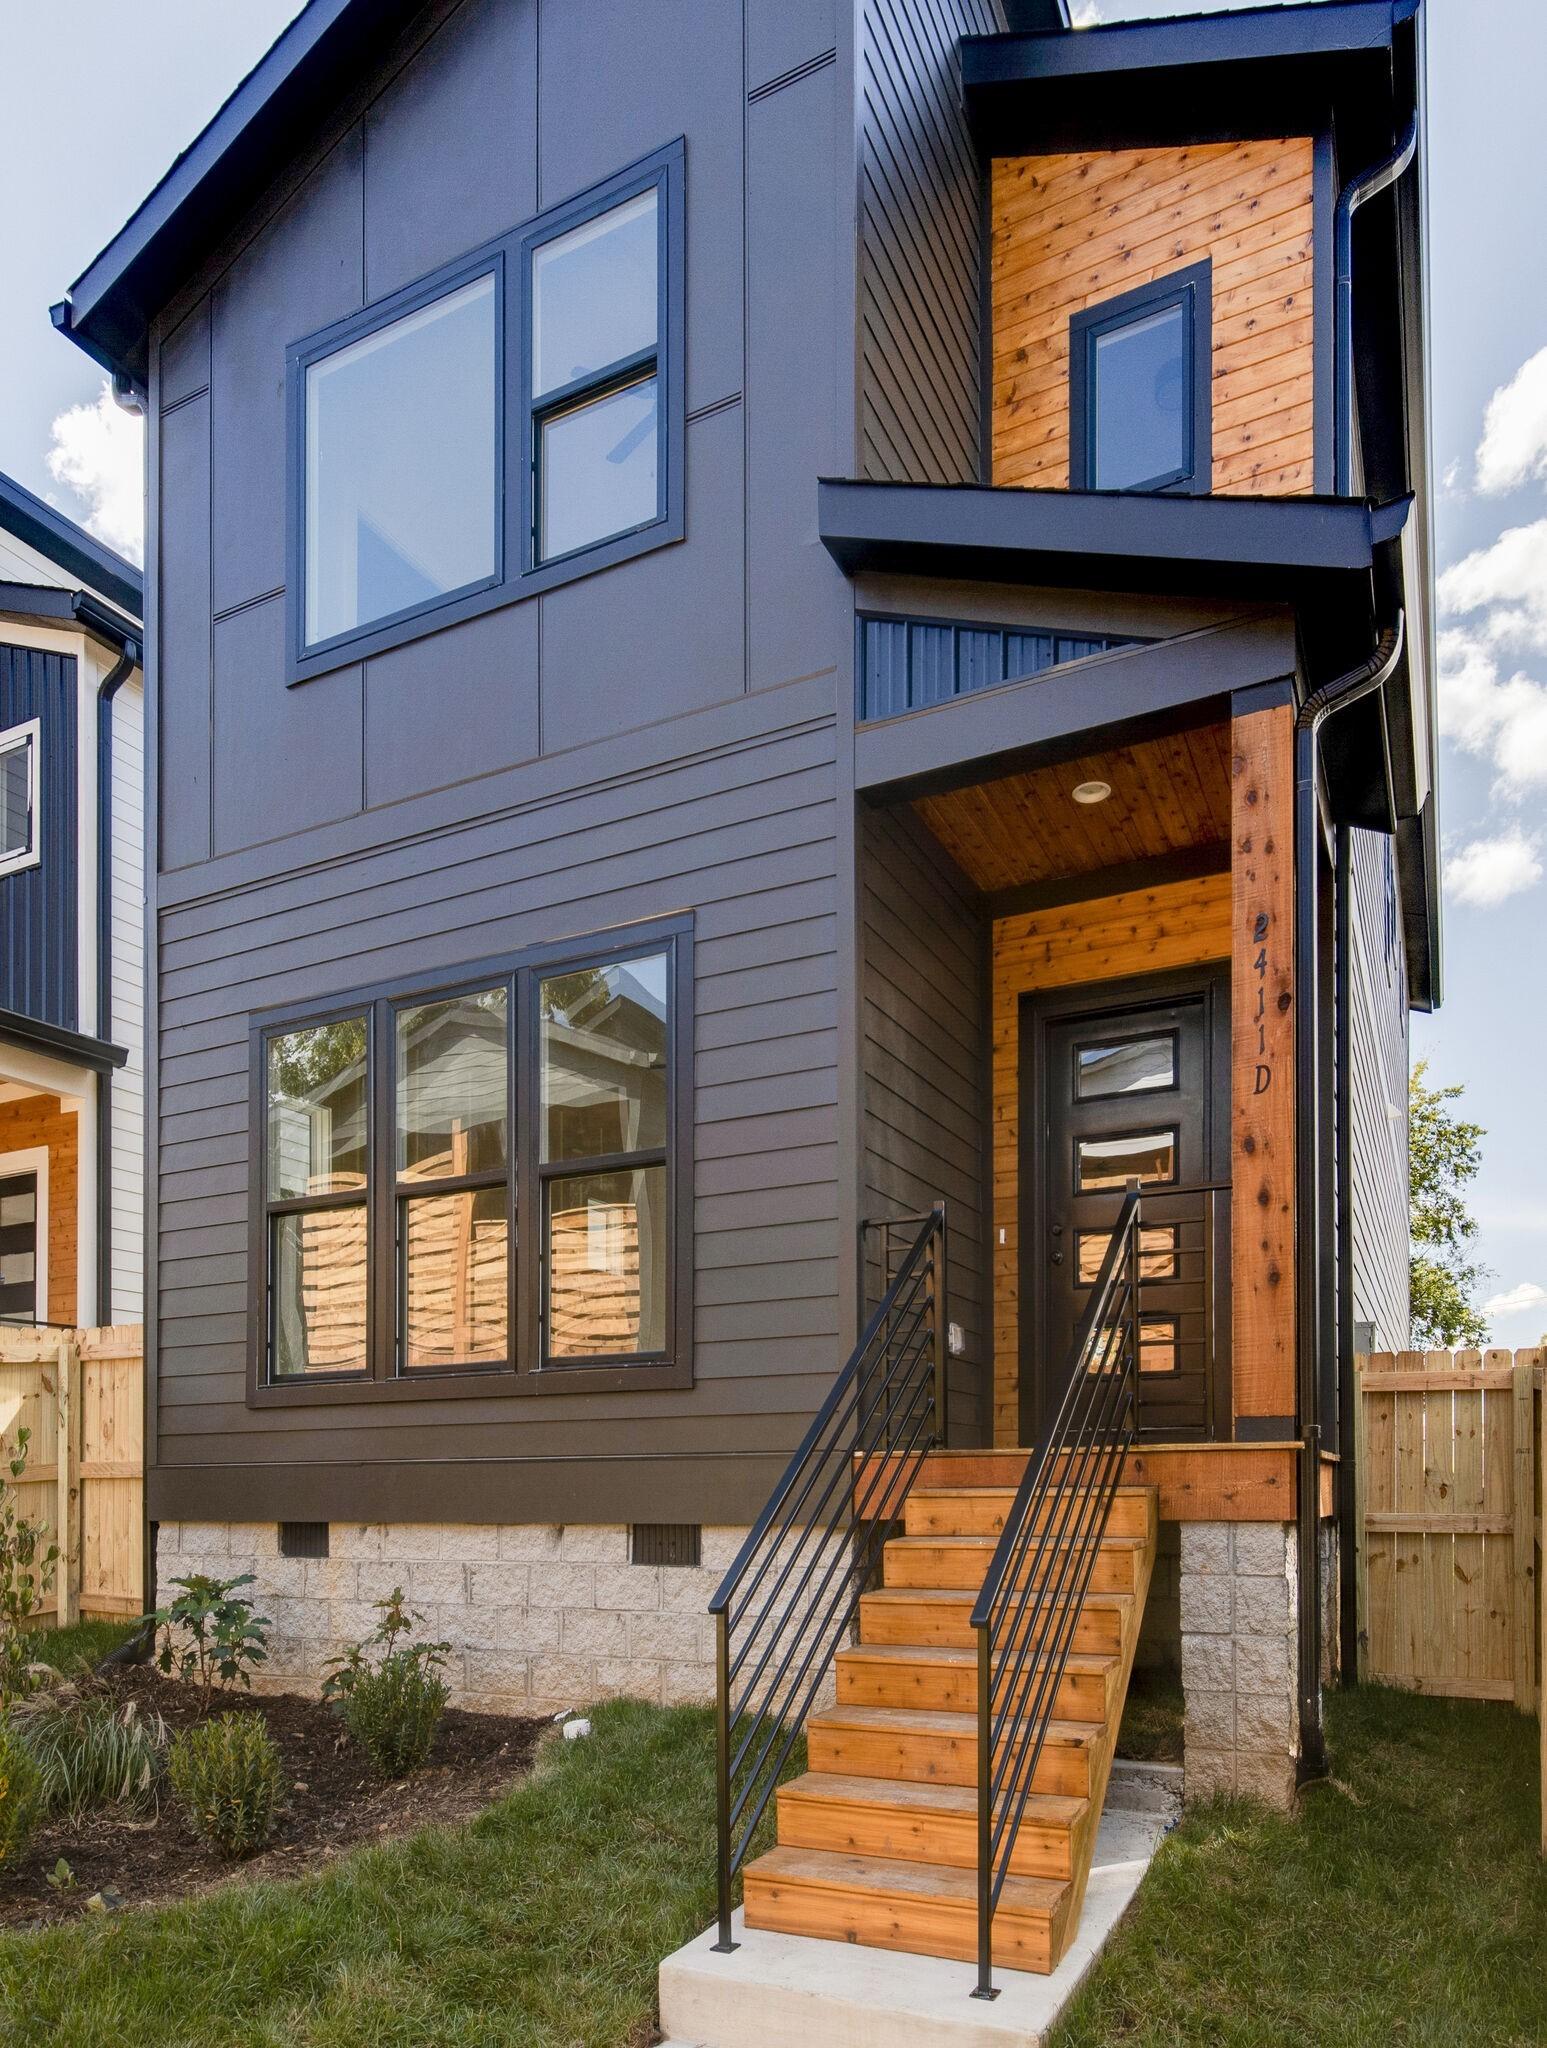 96 Shields Ln Property Photo - Madison, TN real estate listing